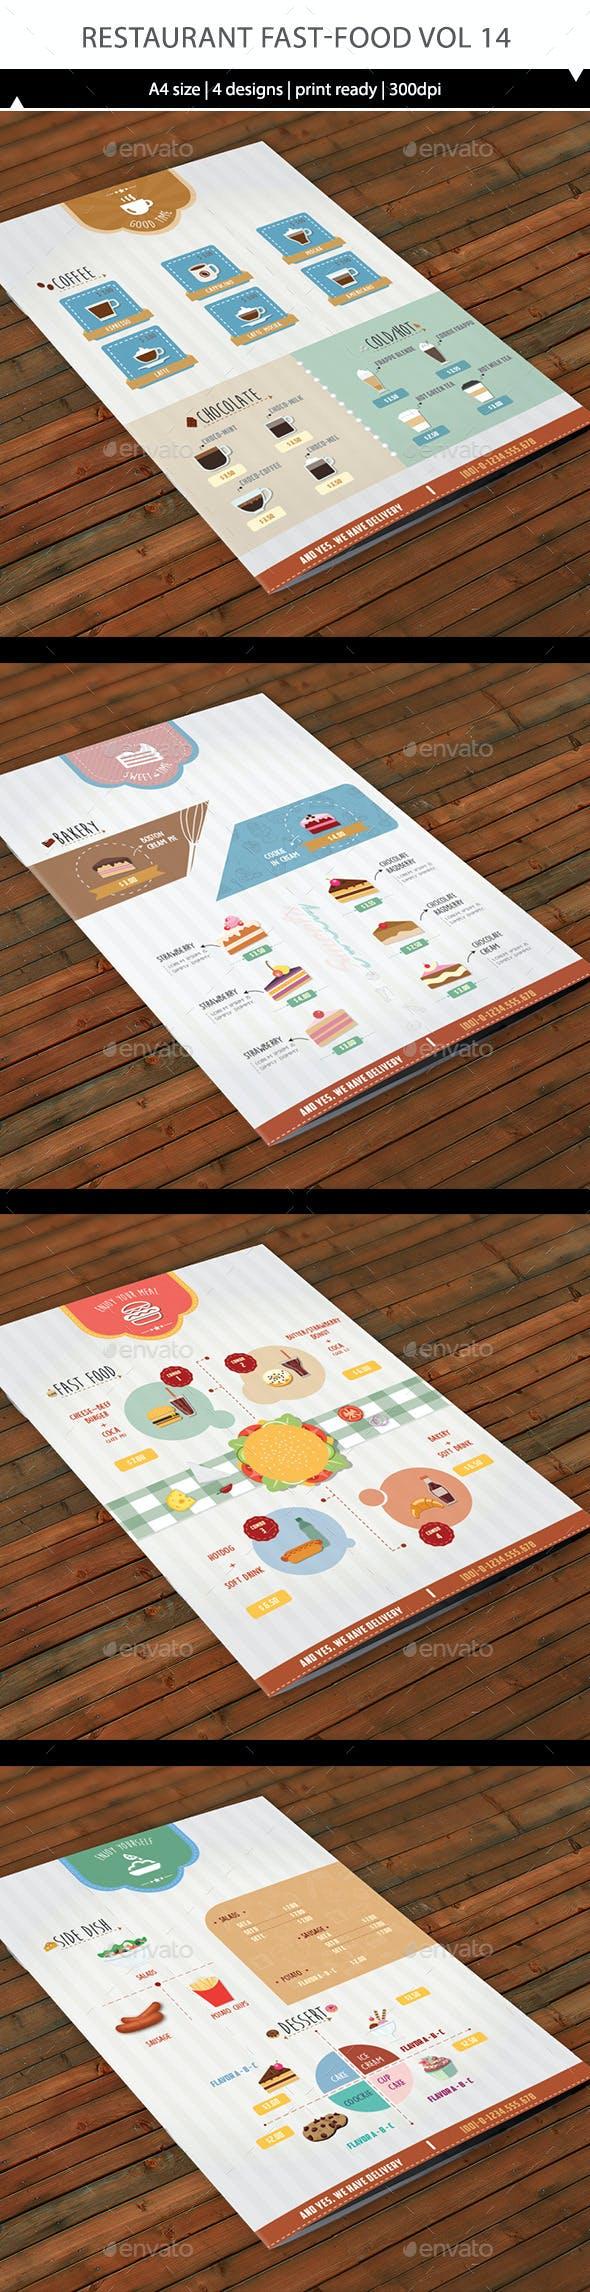 Restaurant Fast-Food Vol 14